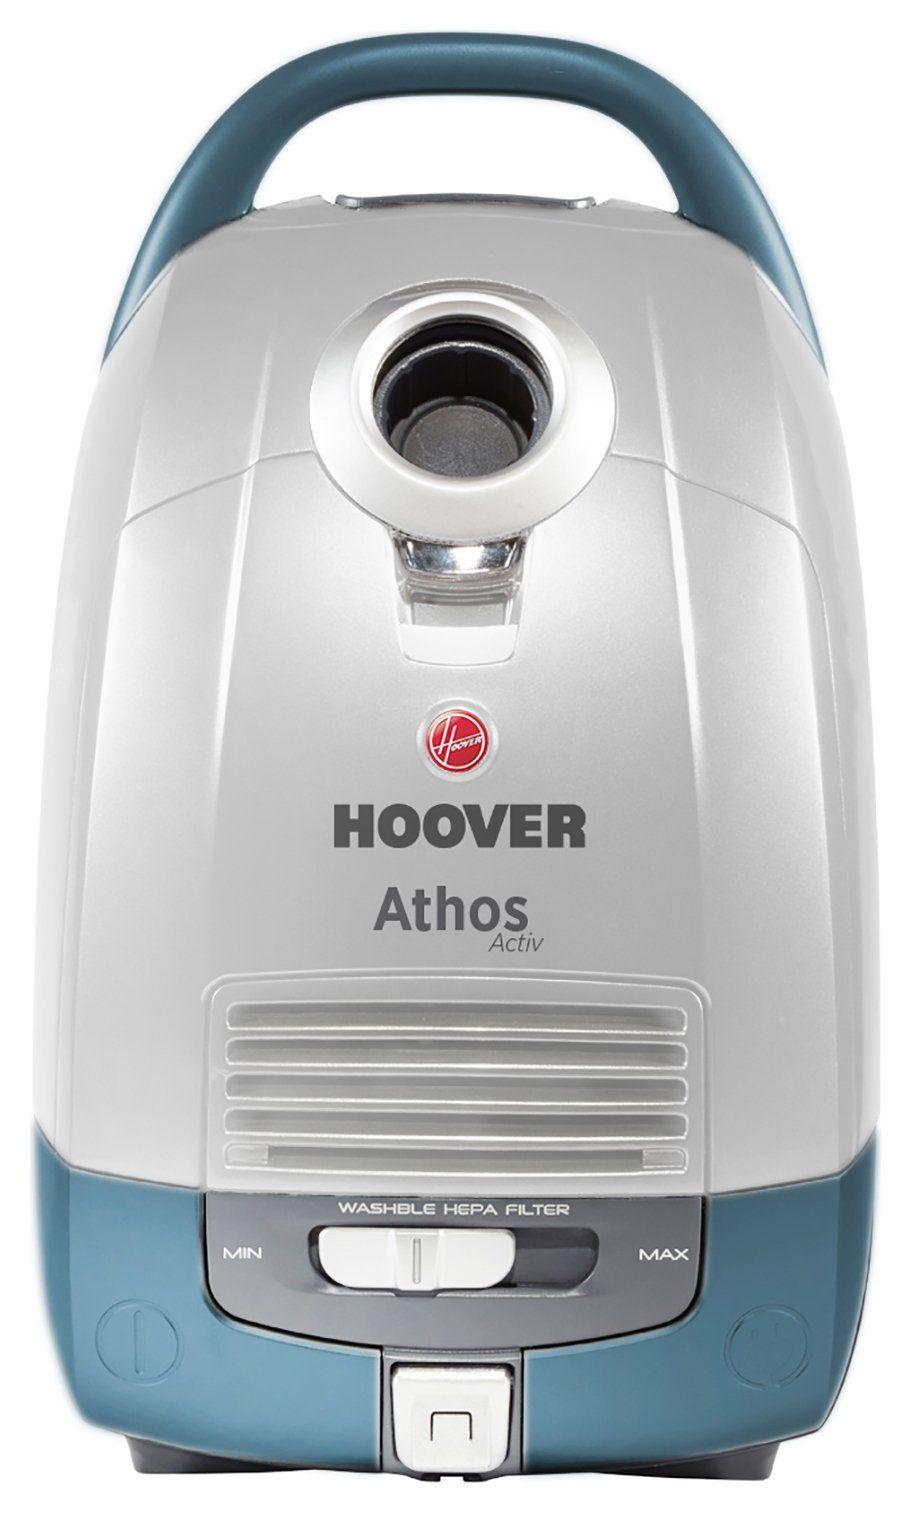 Hoover Athos Activ Cordless Cylinder Vacuum cleaner. Atc18li - £39.99 @ Argos eBay